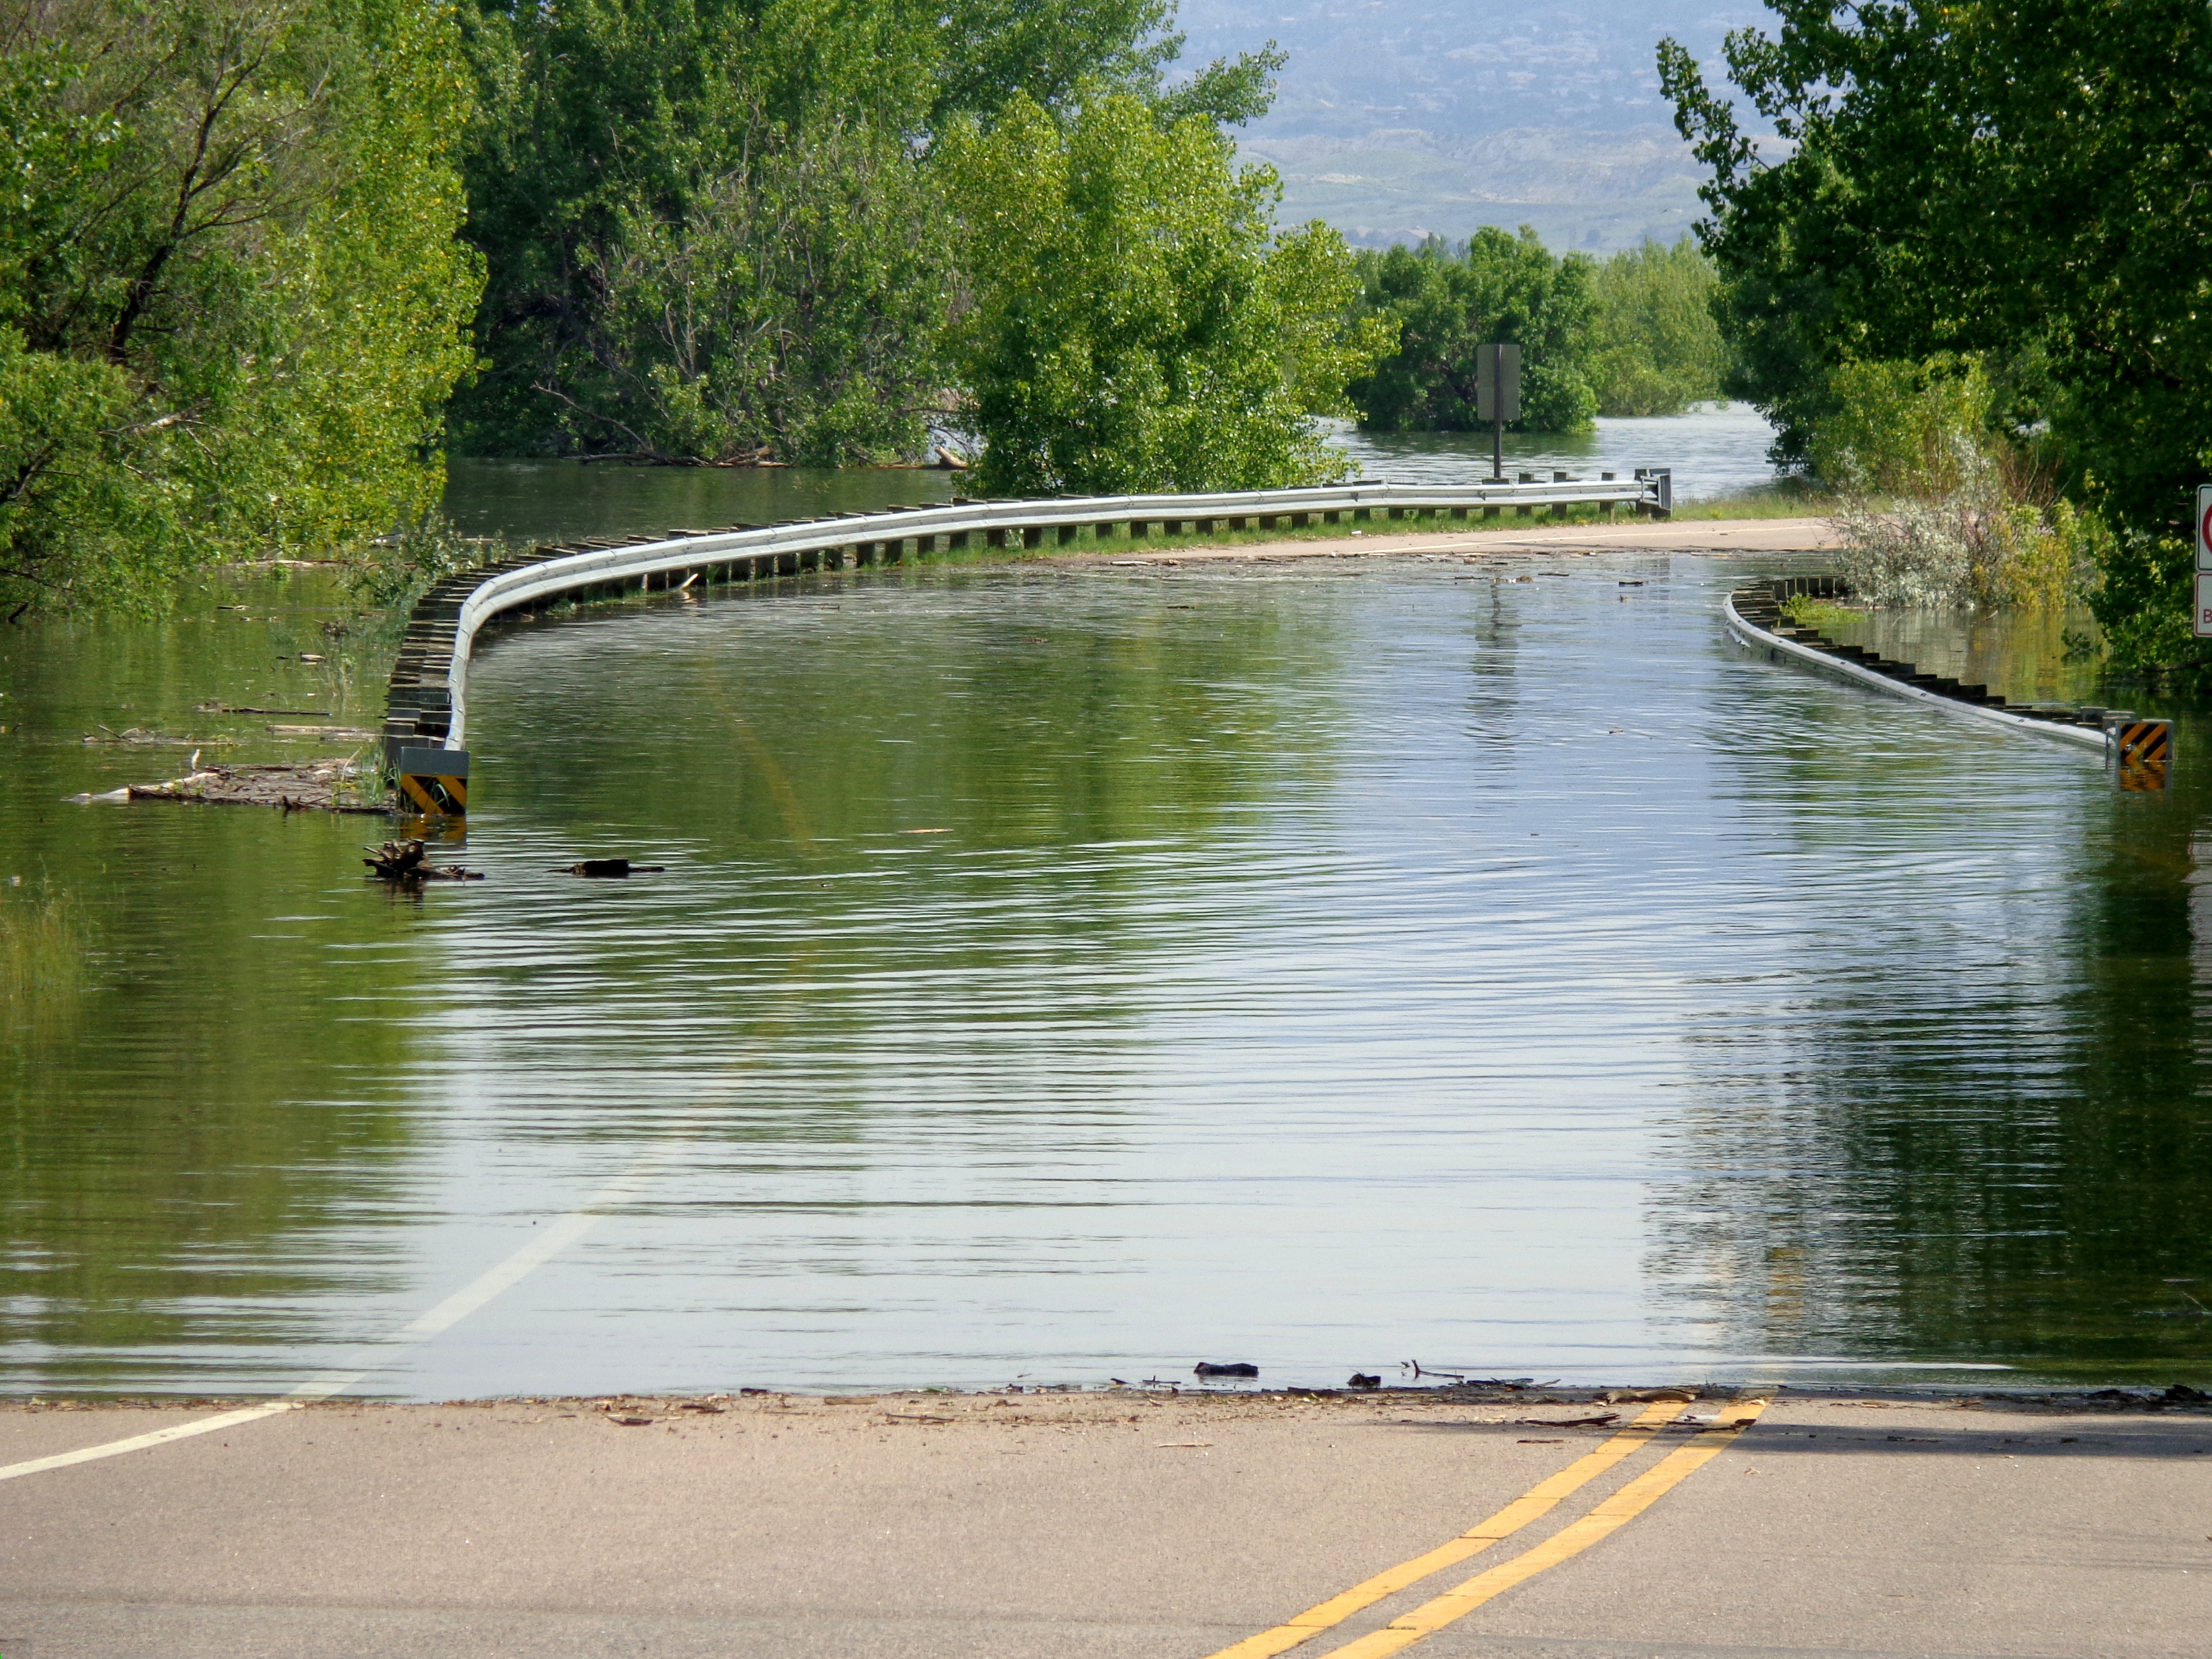 Flooded Bridge Photos Public Domain